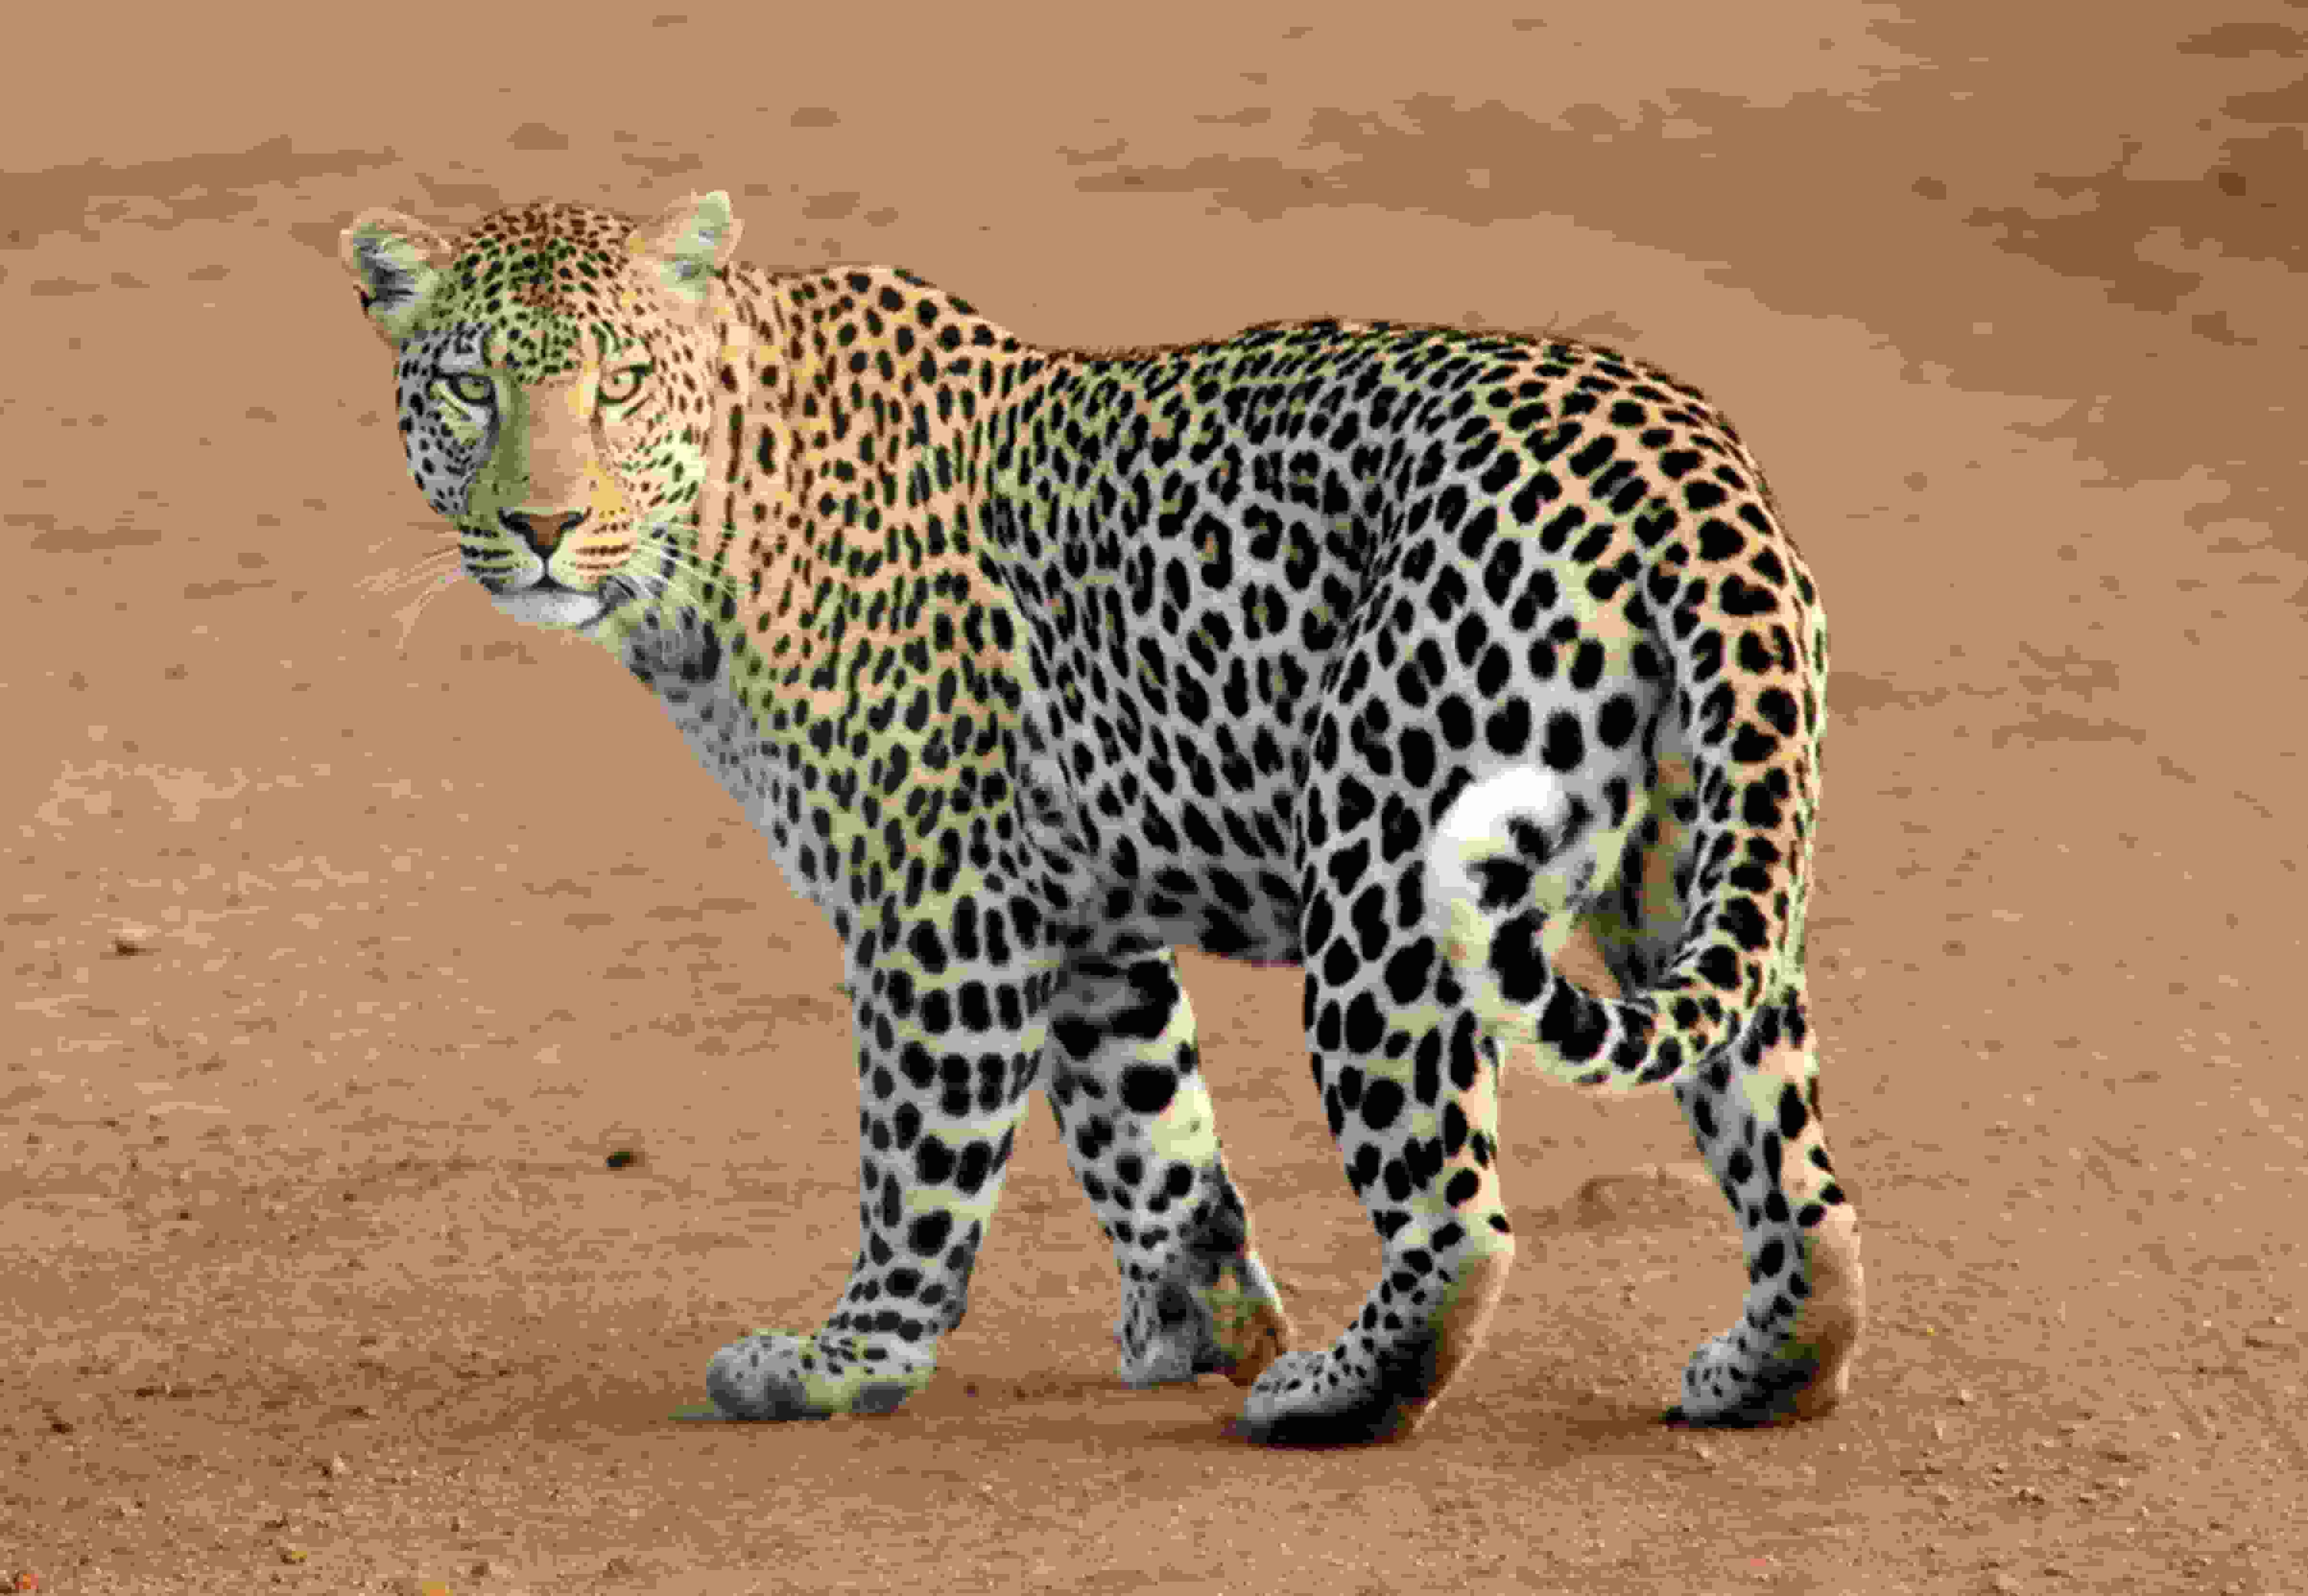 animal-leopard-predator-39857 (1)